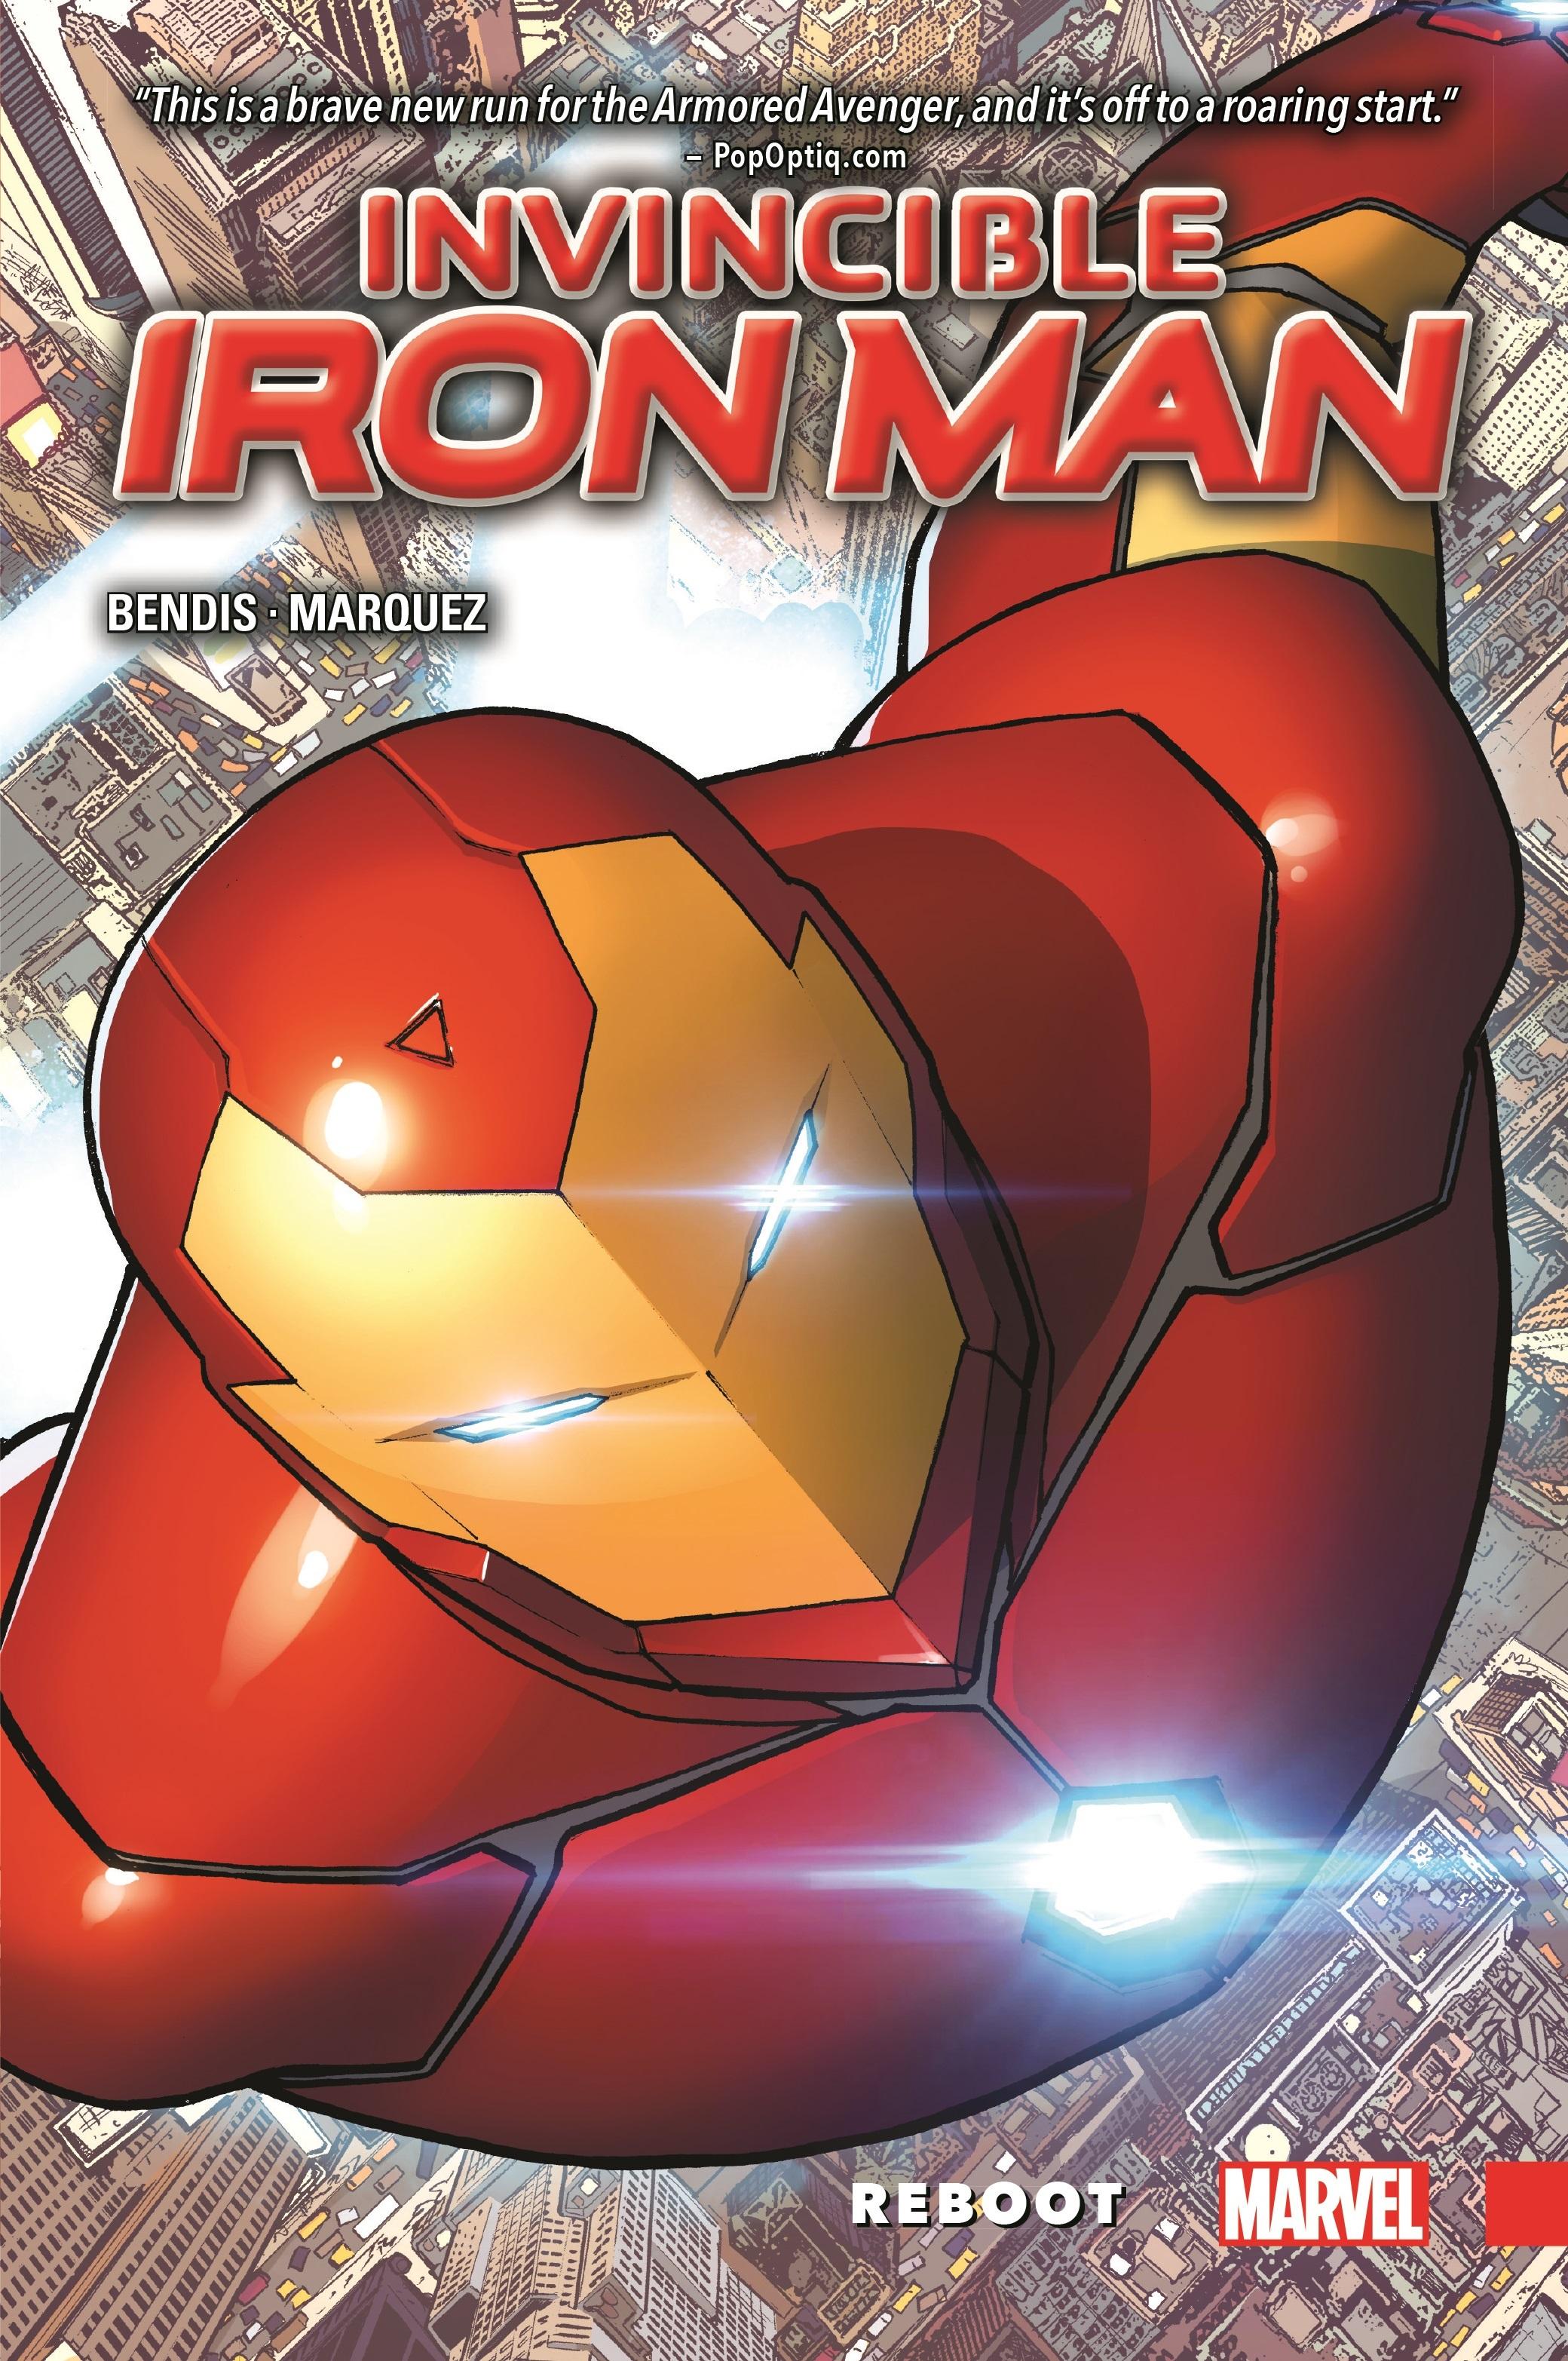 Invincible Iron Man Vol. 1: Reboot (Hardcover)